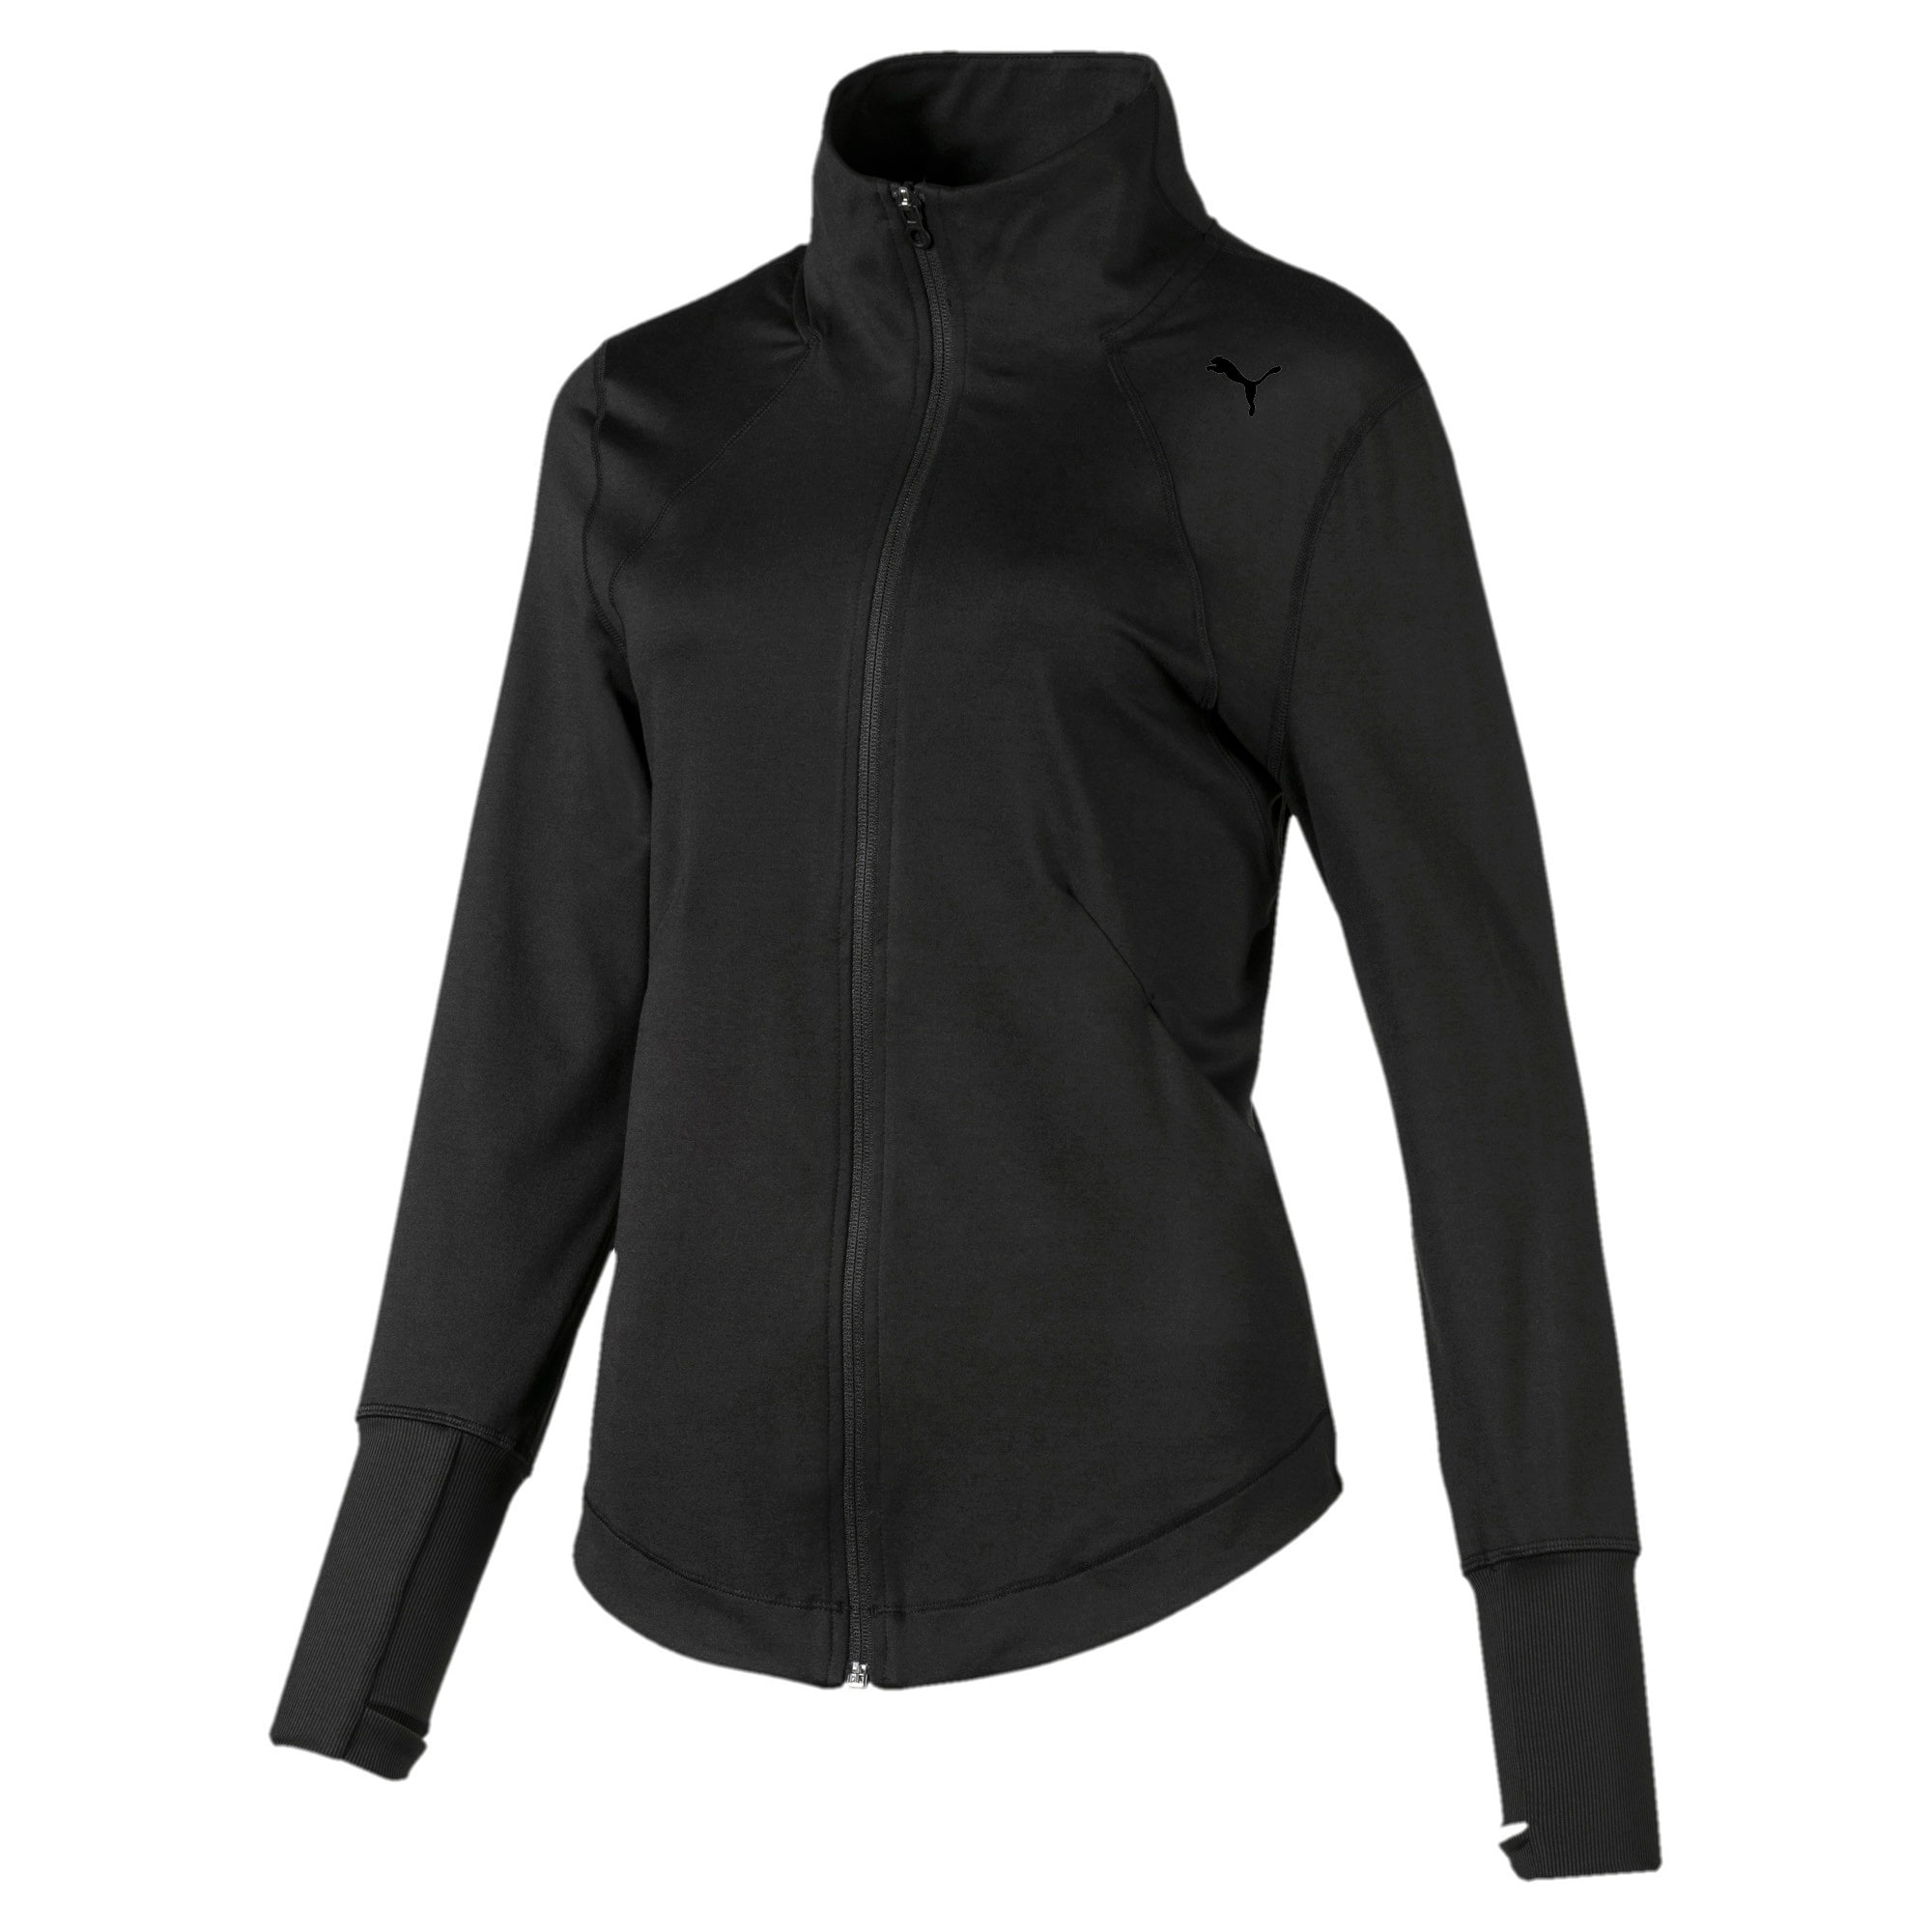 Thumbnail 4 of Studio Knit Women's Training Jacket, Puma Black, medium-IND